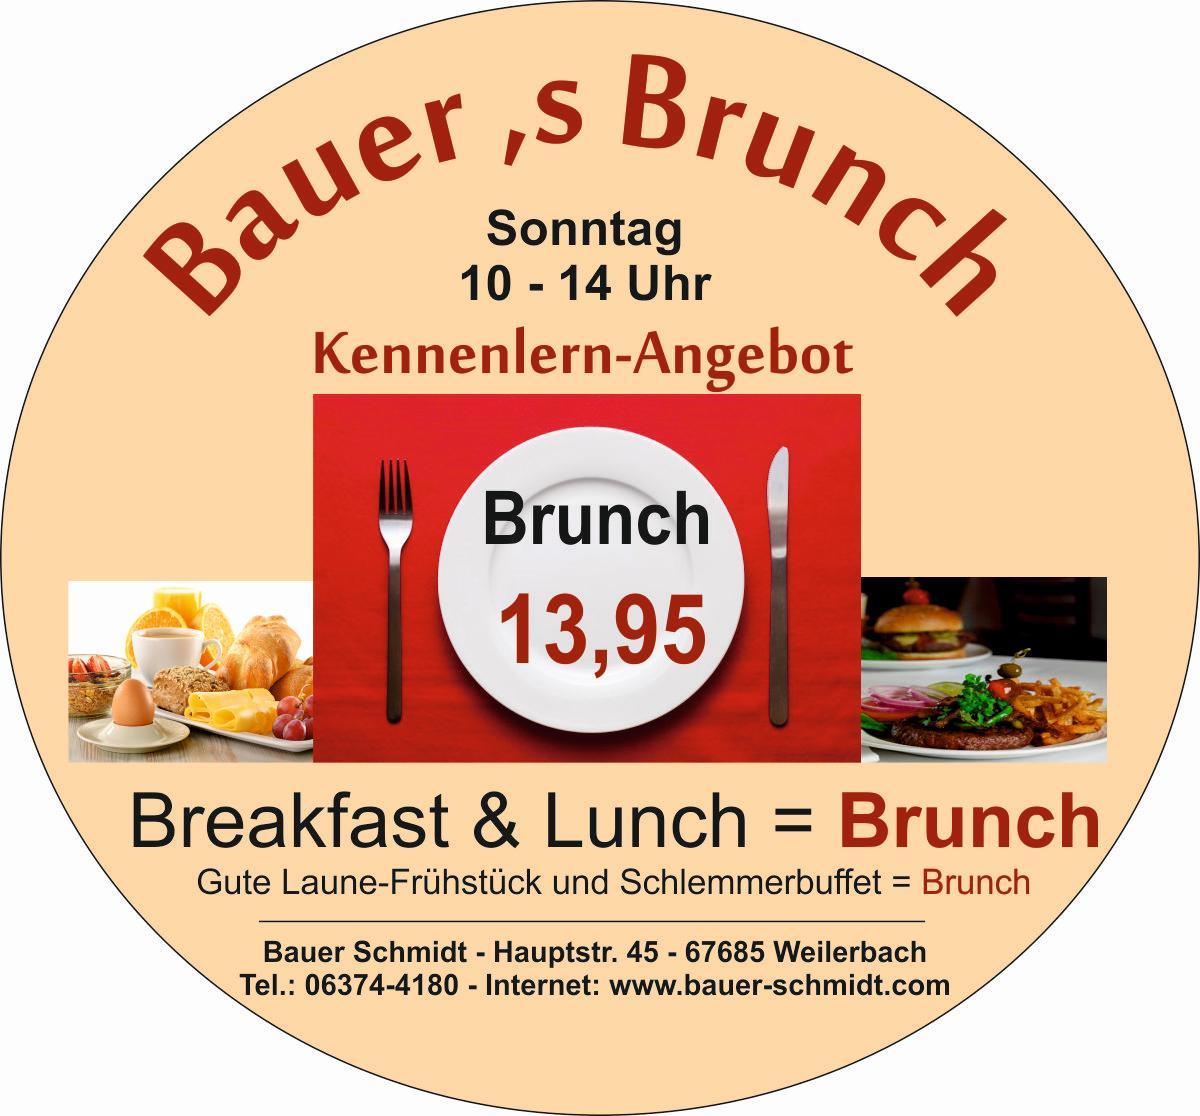 Bauer Schmidt - Brunch